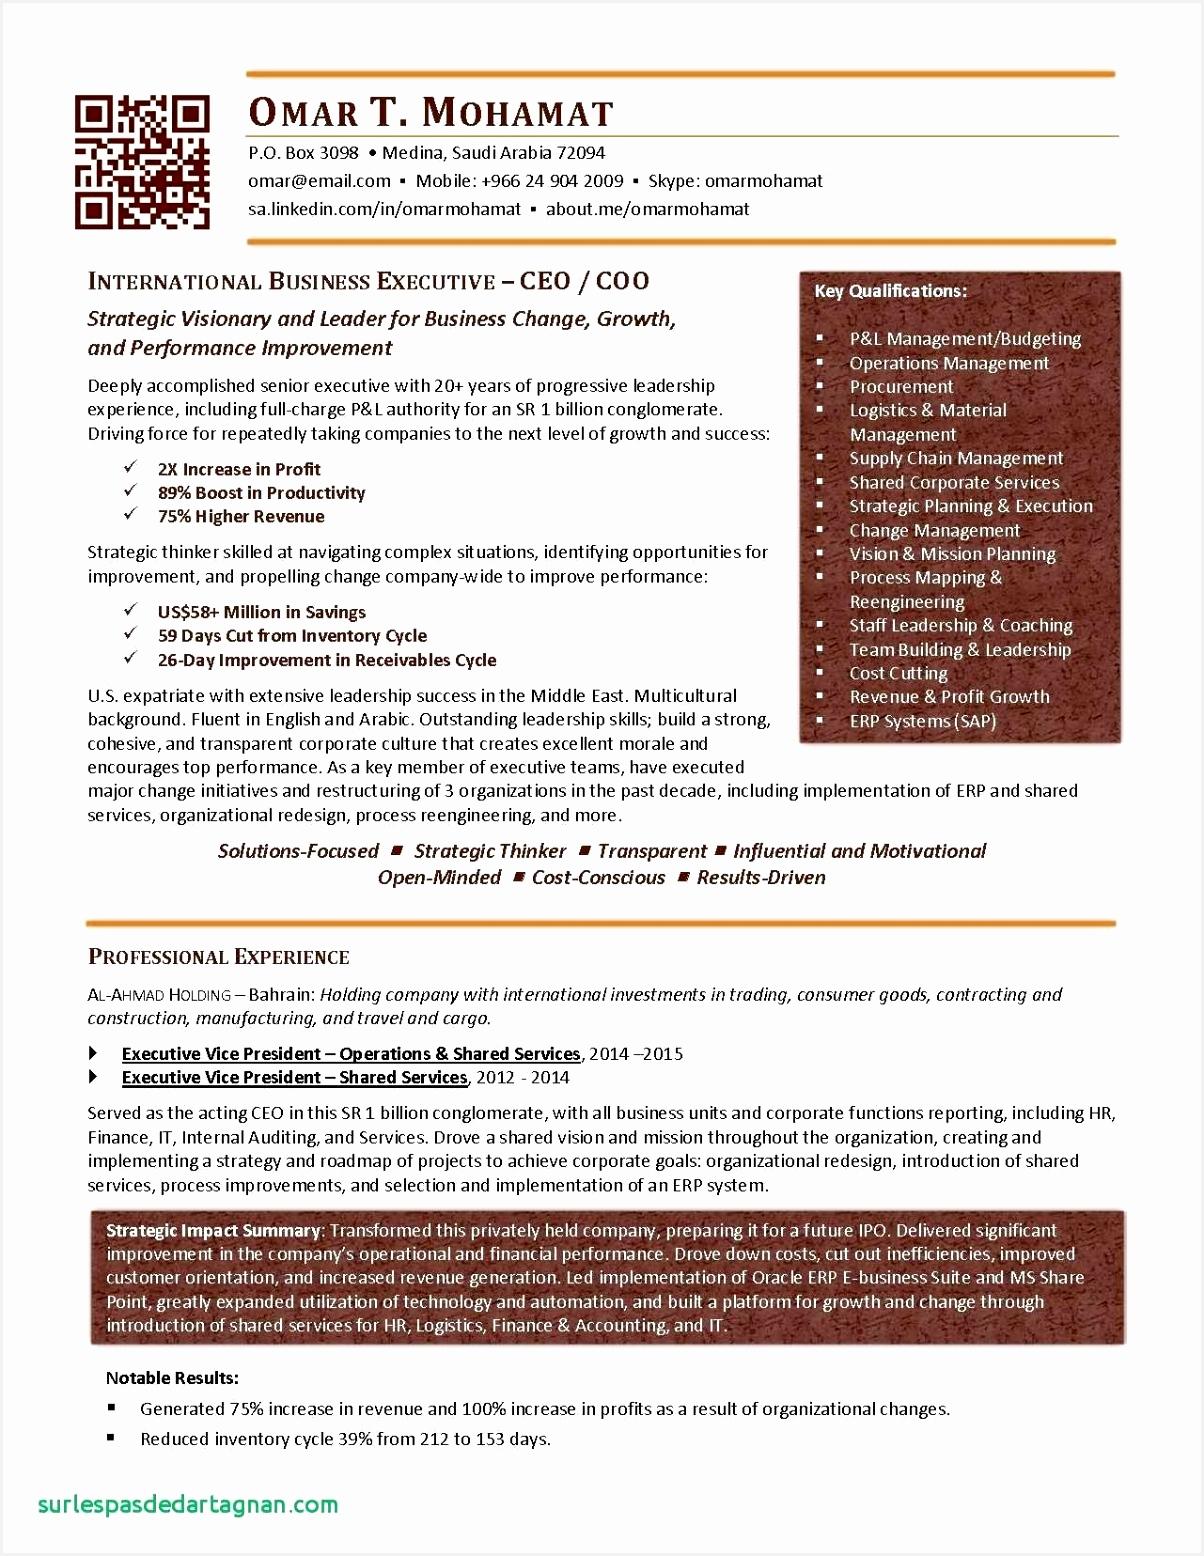 Cv Templates Download Word B7uaj Awesome 200 Free Executive Resume Templates for Word Of 8 Cv Templates Download Word